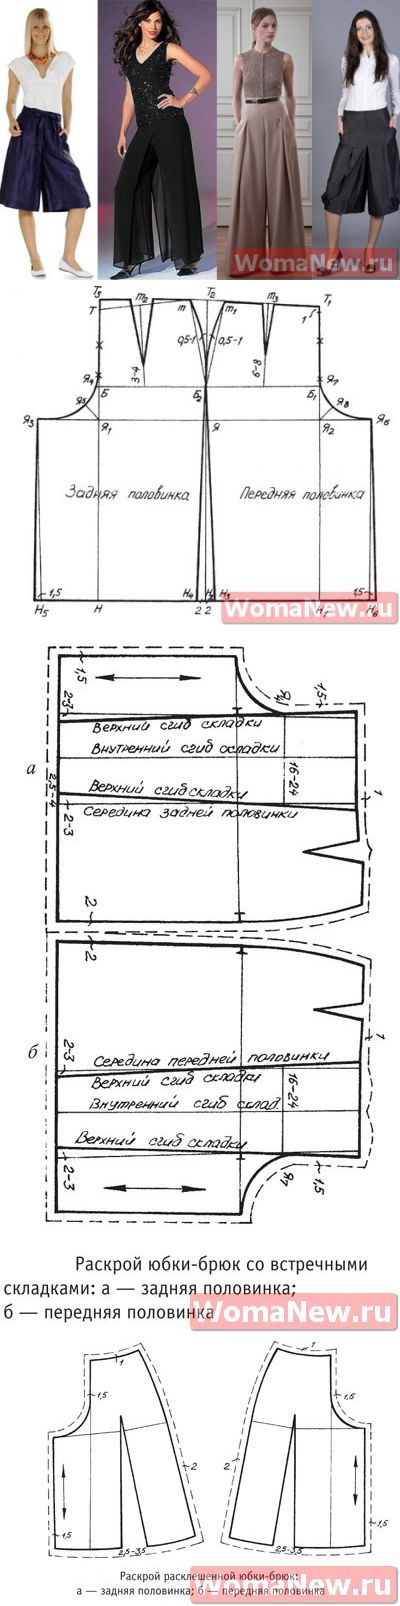 pantalones de la falda del patrón | WomaNew.ru - clases de costura.